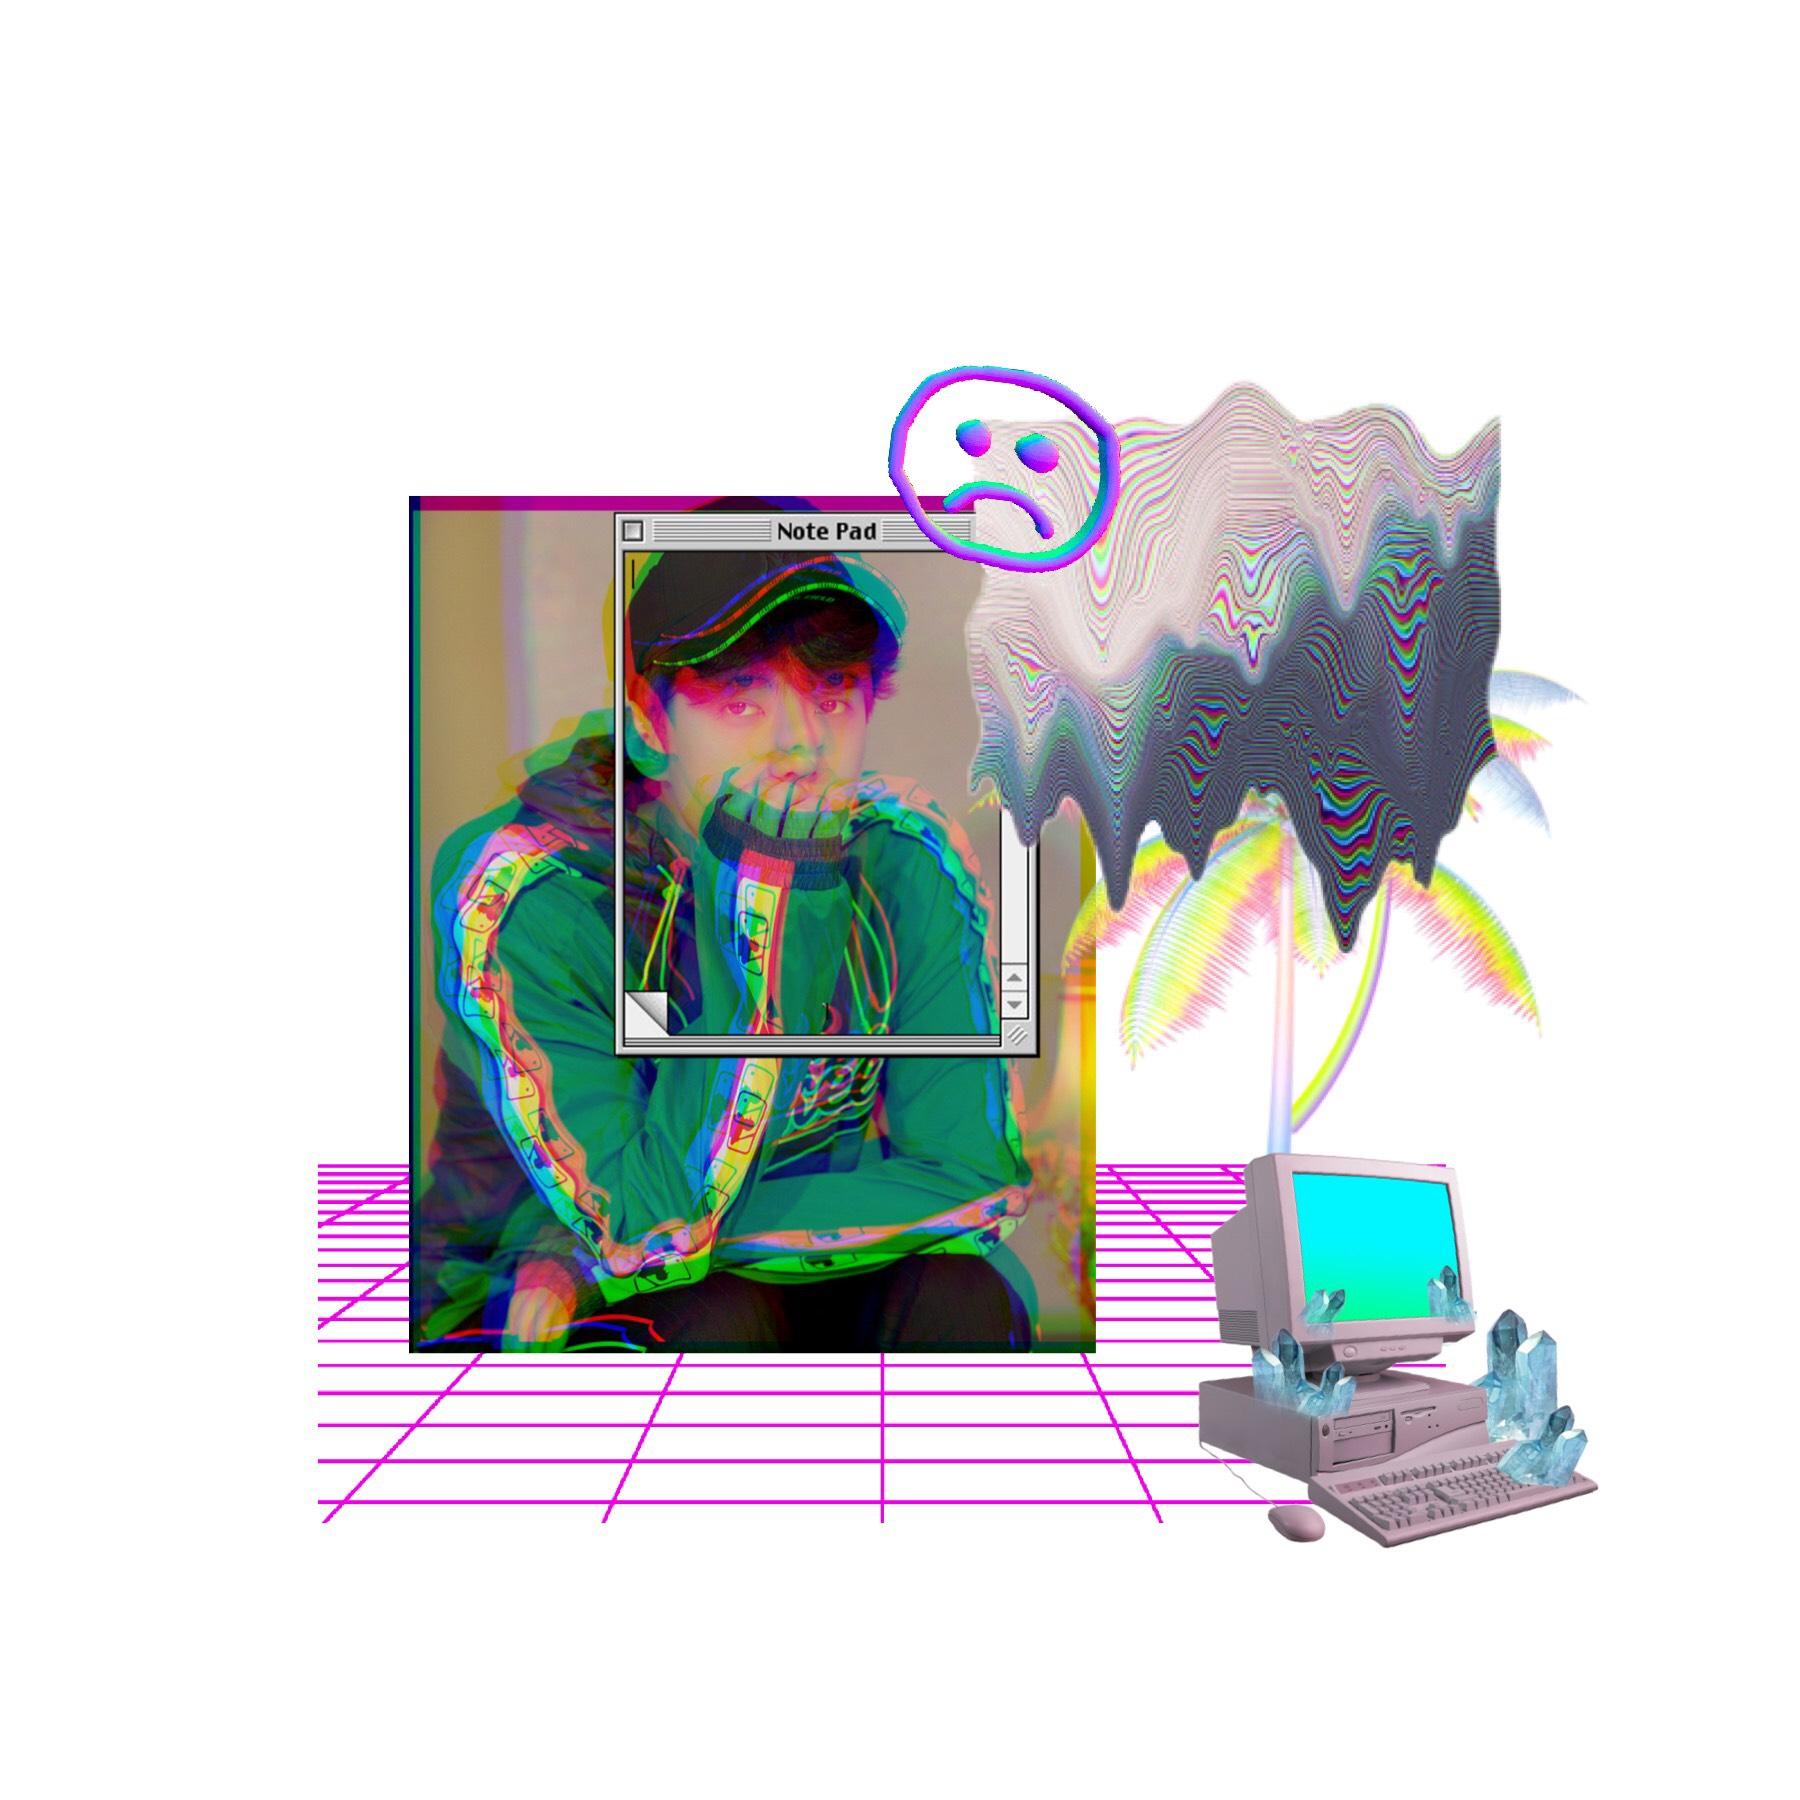 vaporwave sehun 🧷💜📗🐥